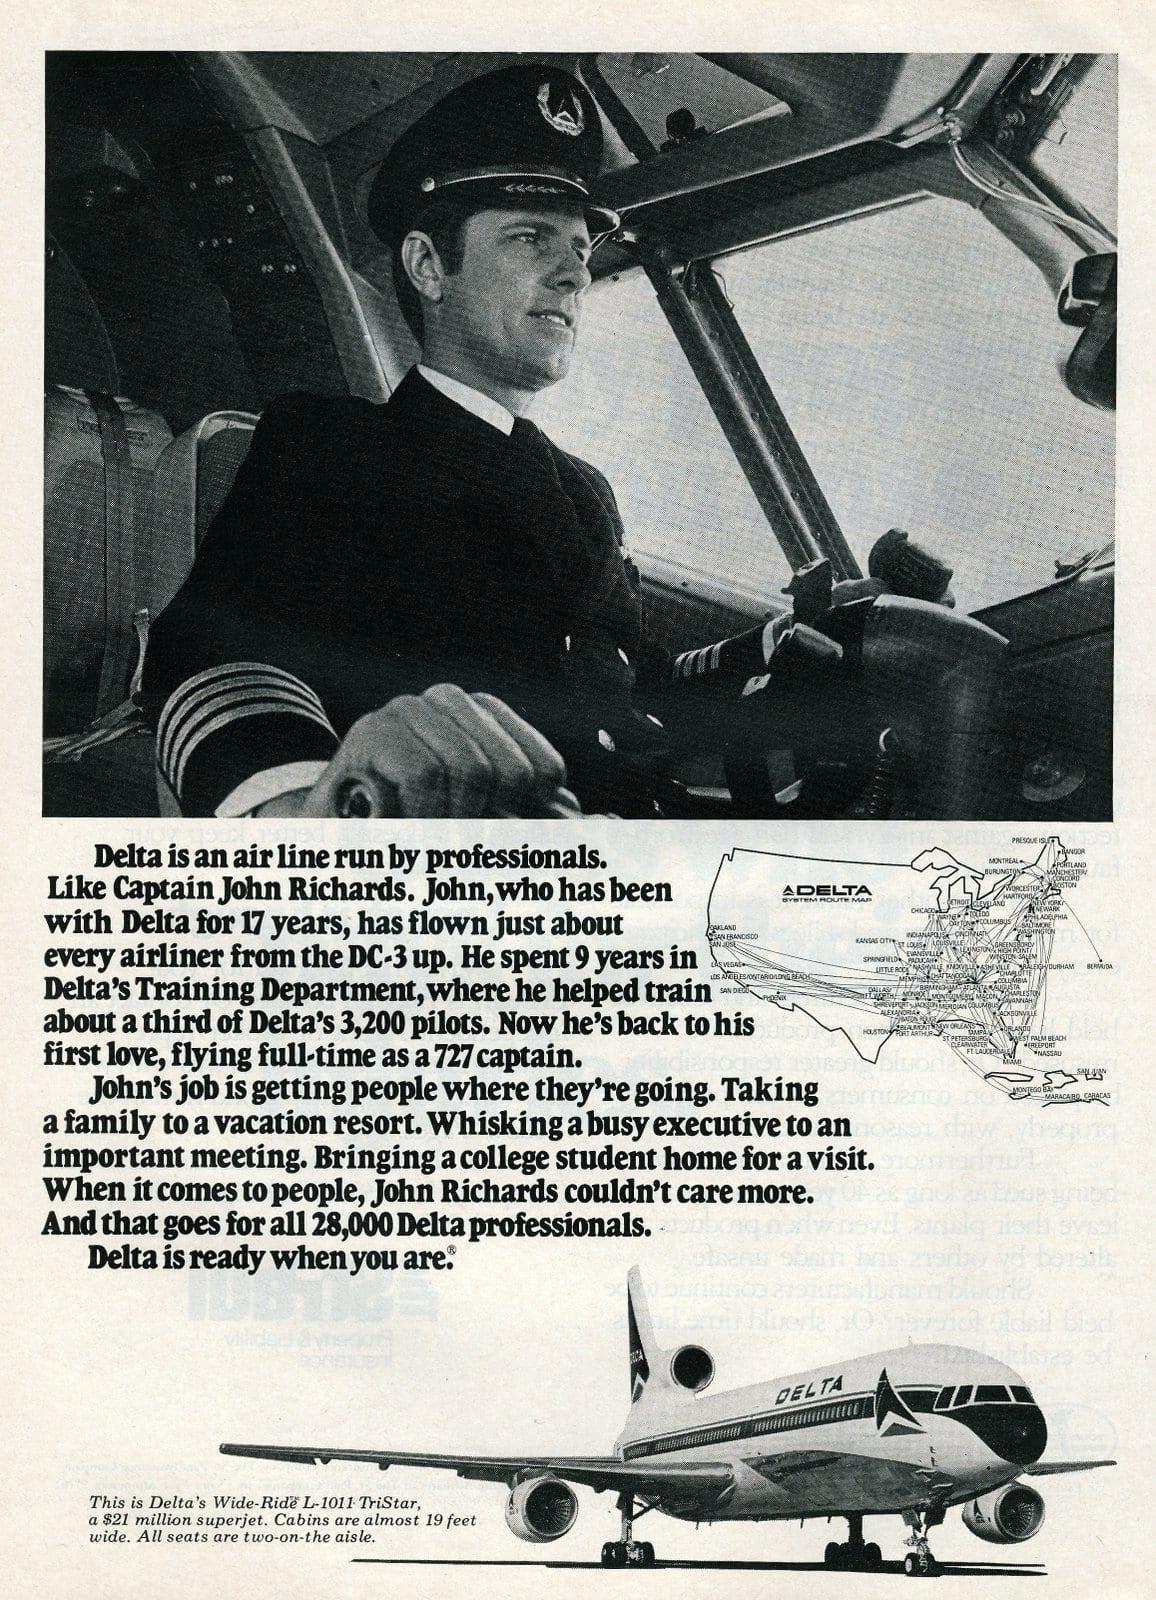 Delta Pilot Captain John Richards (1977)